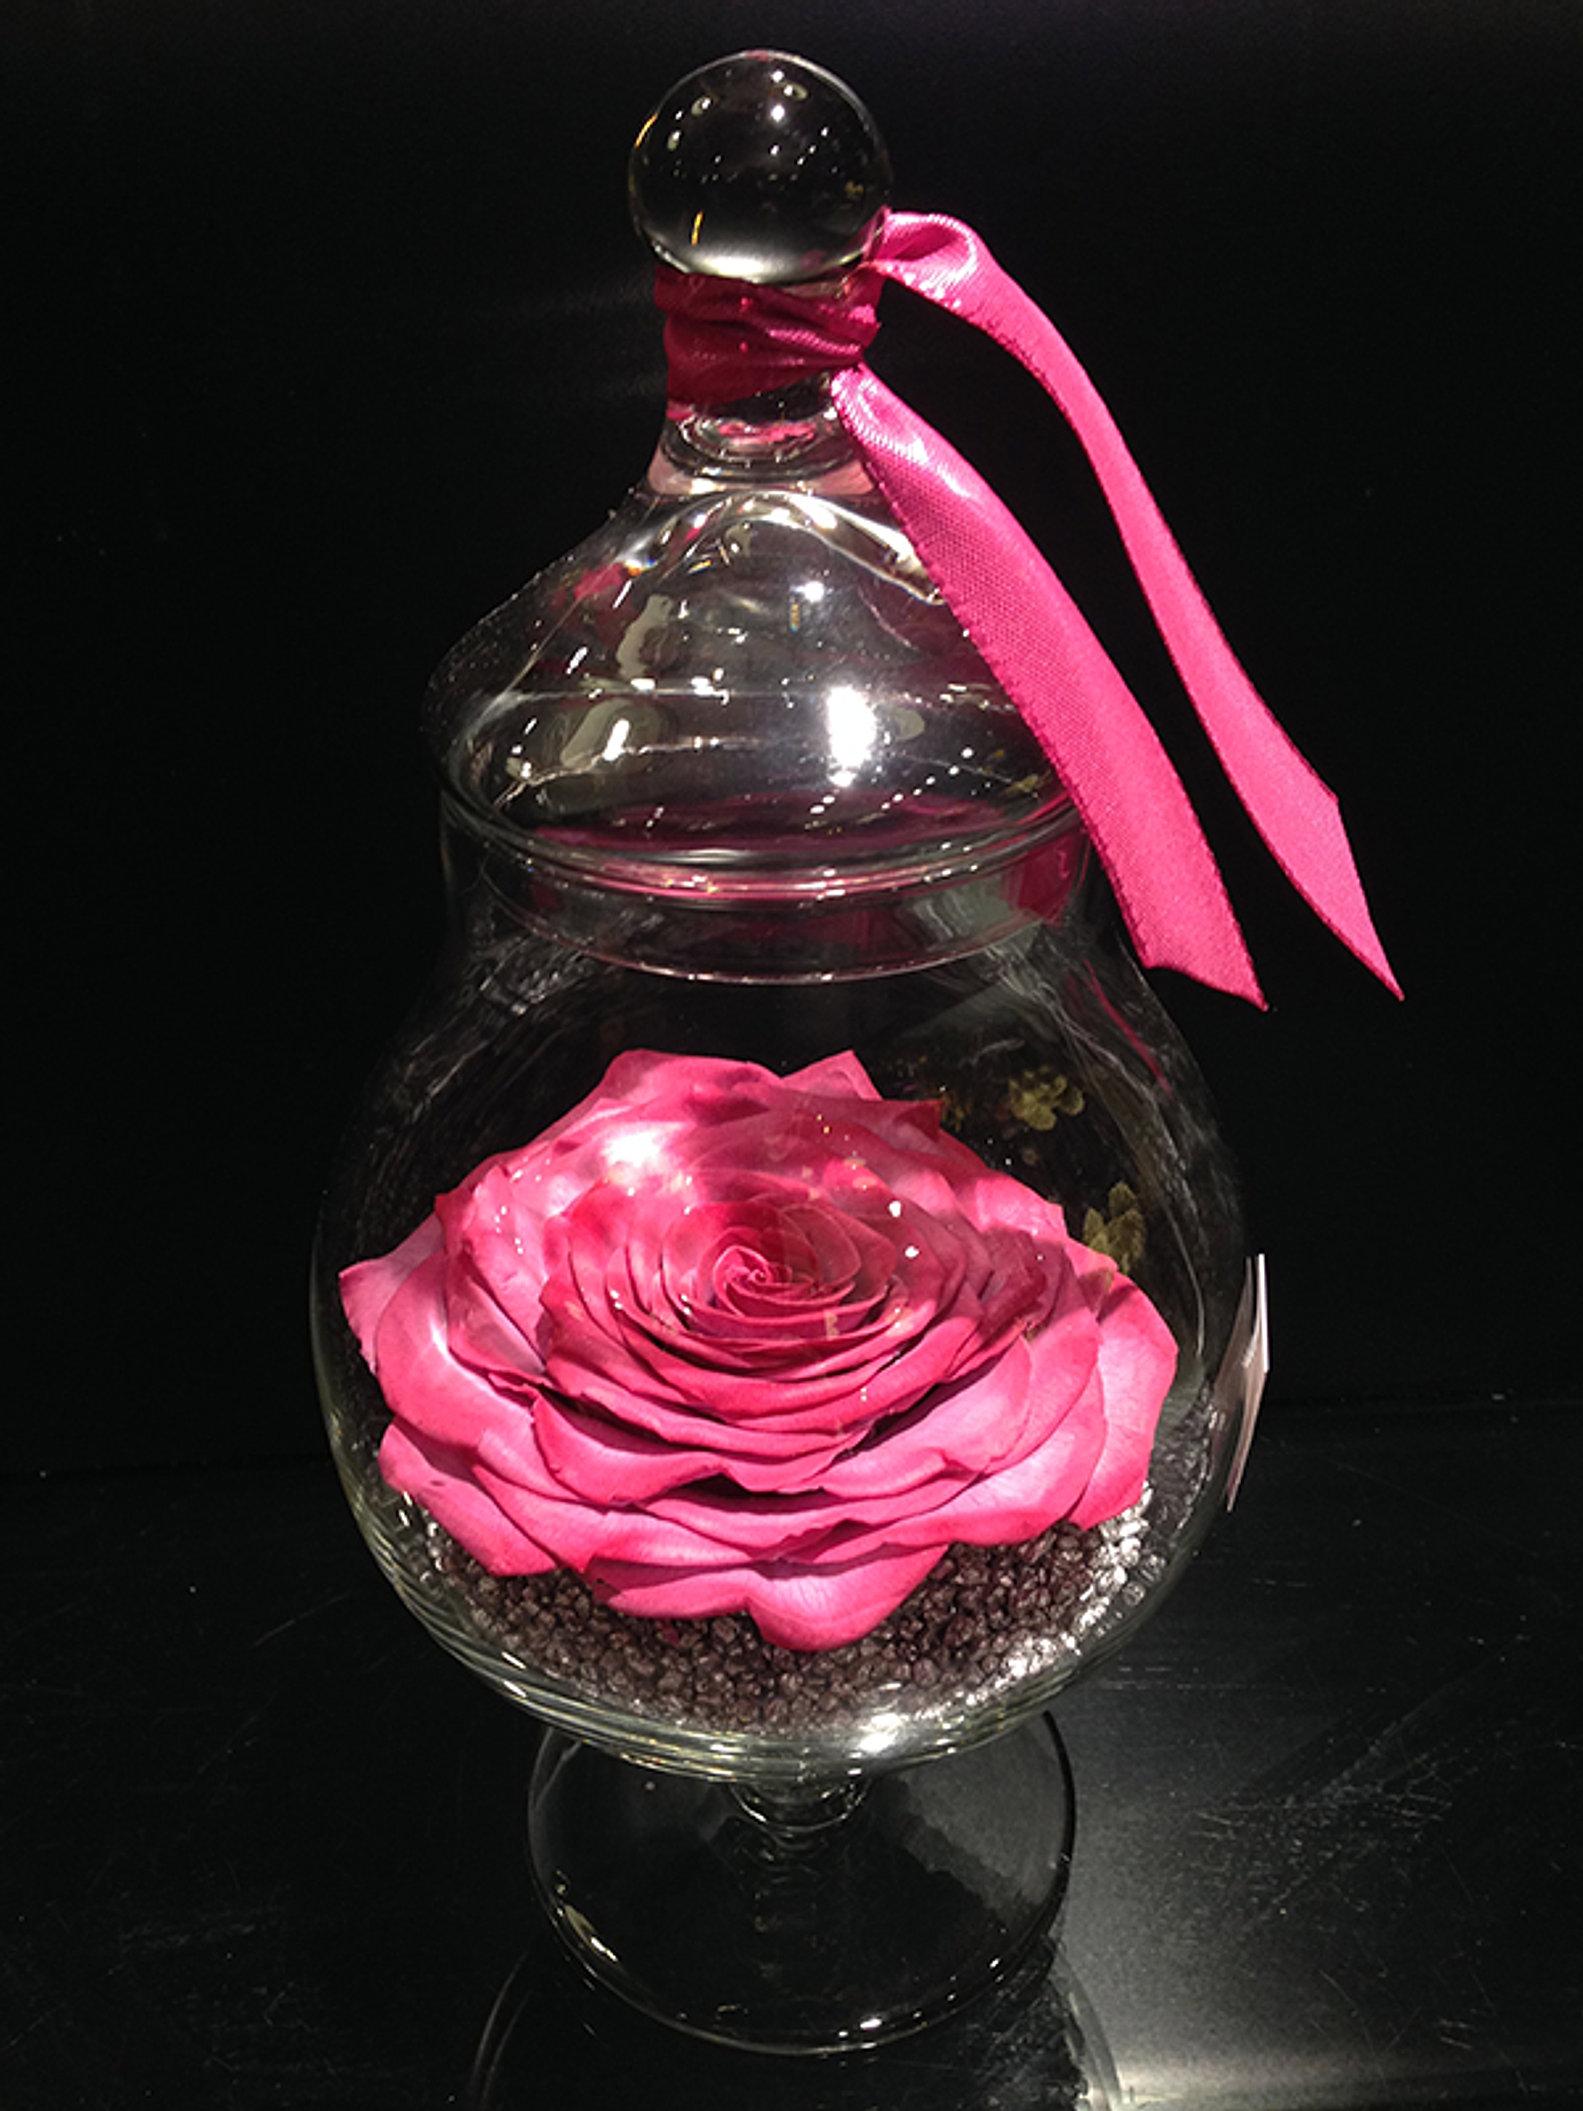 rose stabilisee roses eternelles auxerre yonne. Black Bedroom Furniture Sets. Home Design Ideas